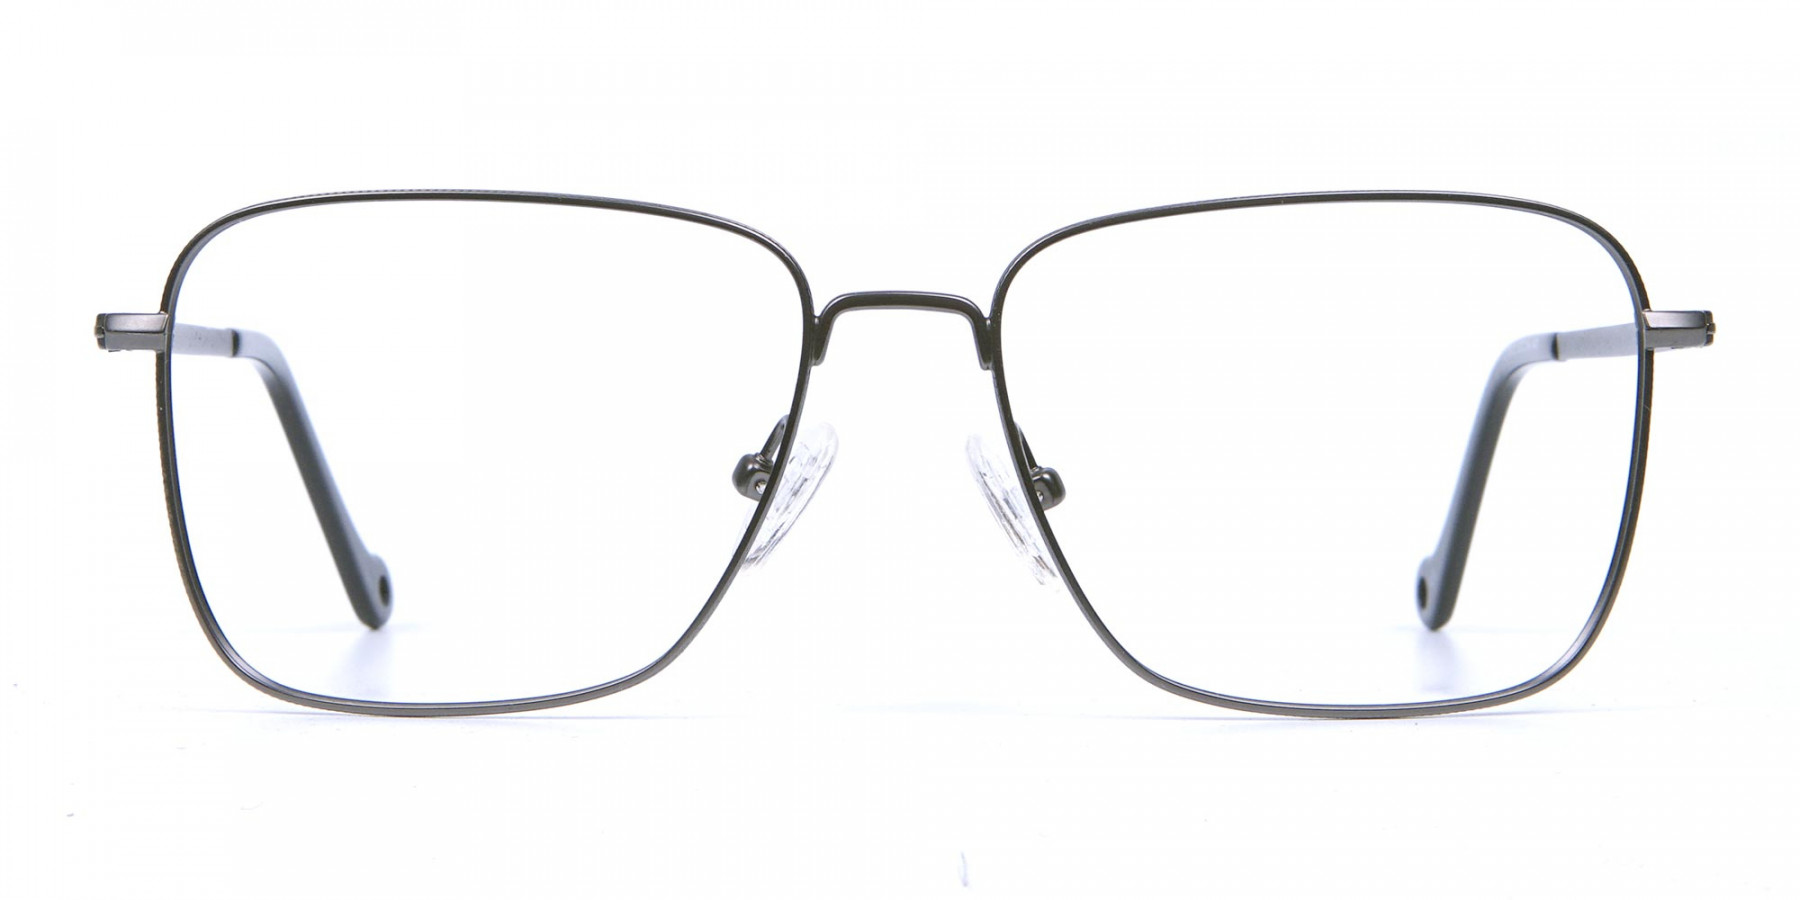 Gunmetal Square Glasses, Eyeglasses